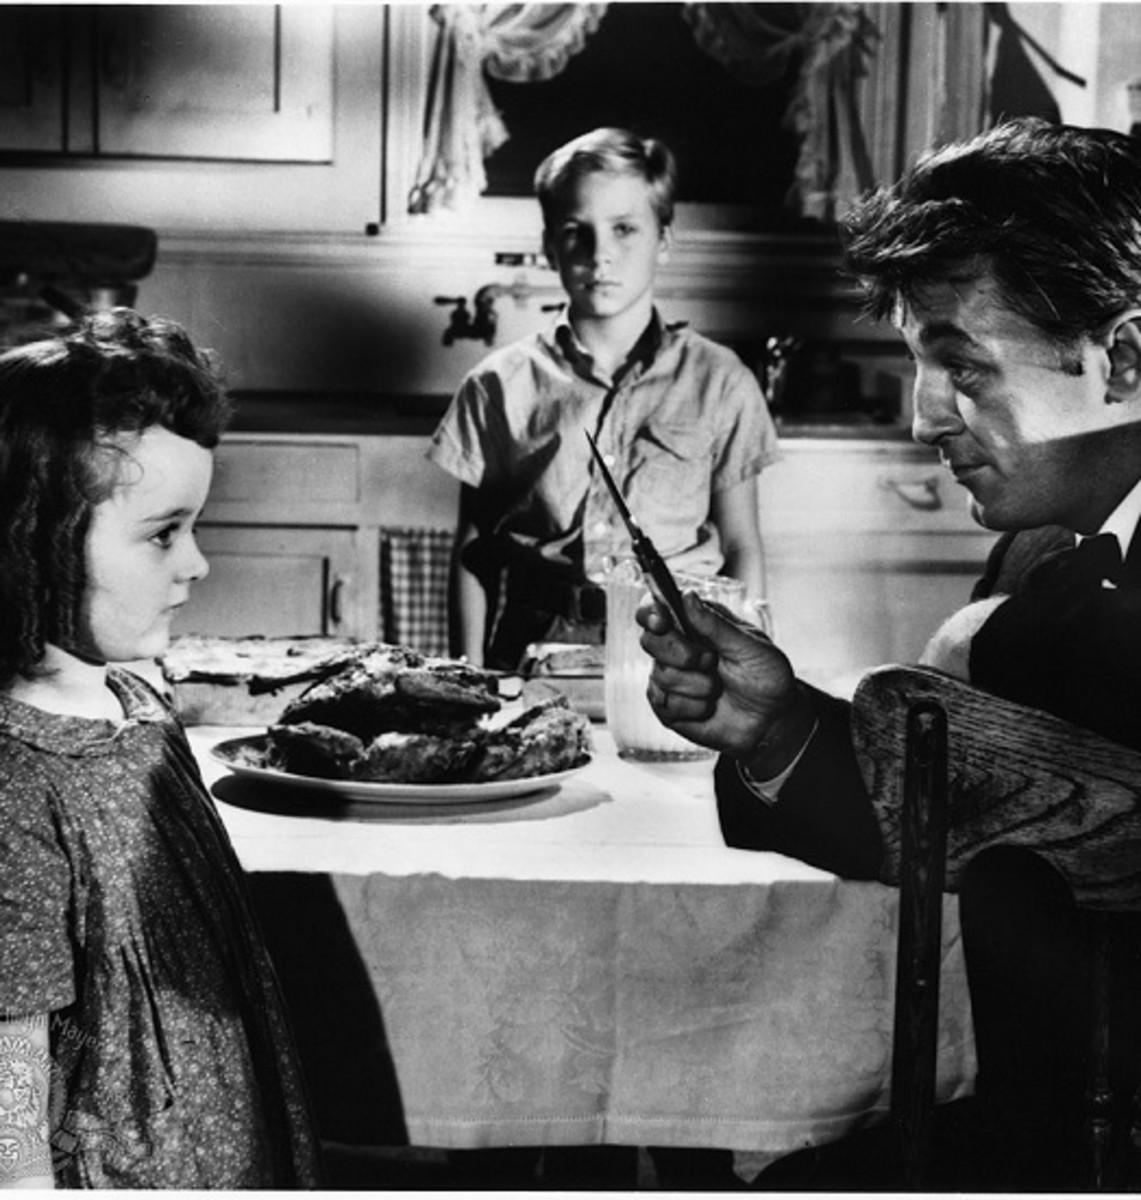 Night of the hunter(1955)